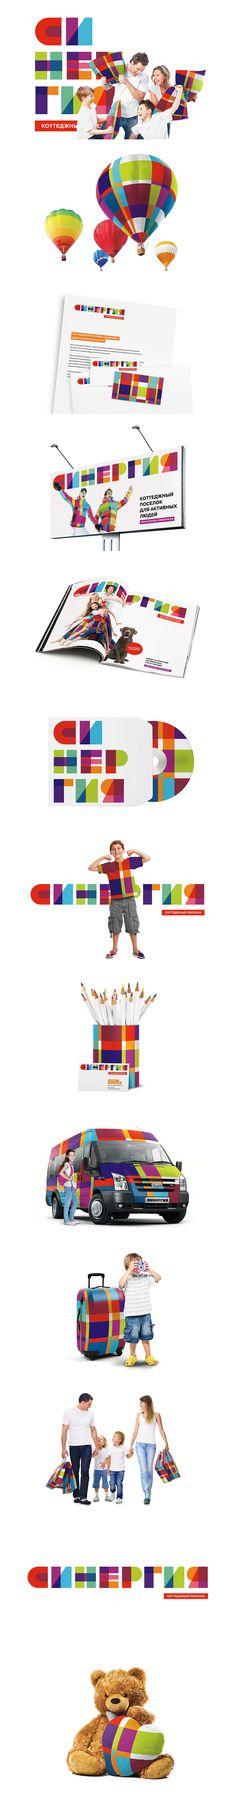 colourful identity!